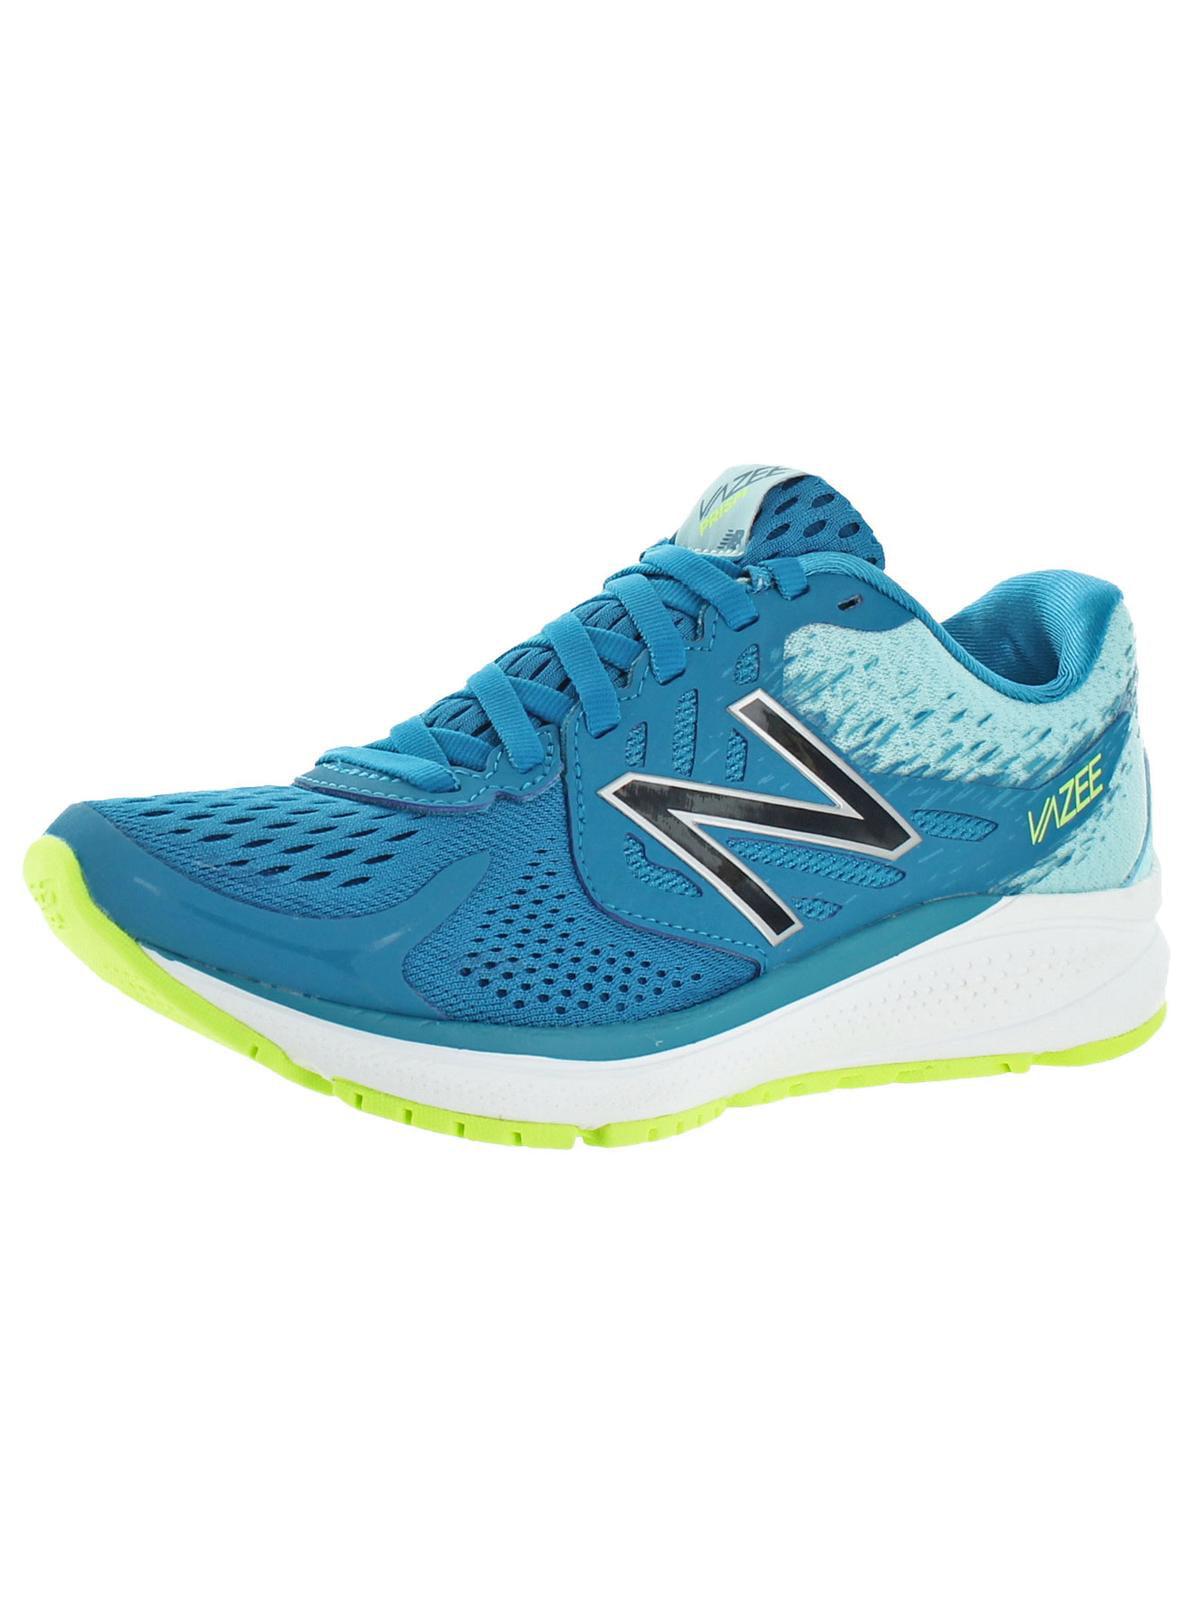 New Balance Womens Vazee Prism REVlite Running Shoes Blue 5 Medium (B,M)